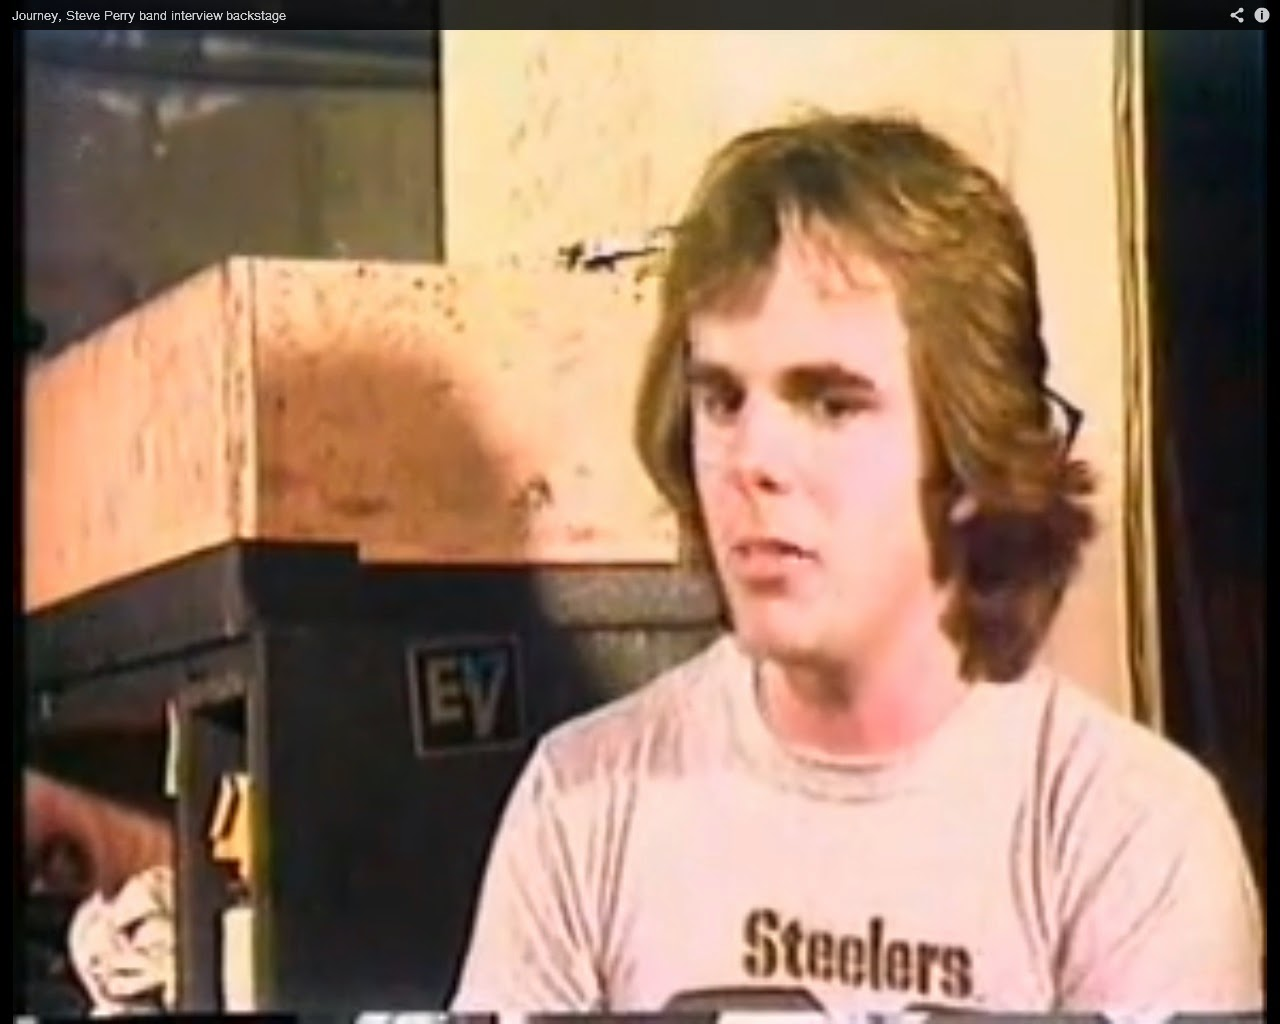 Jonathan Cain Wearing Steelers Shirt